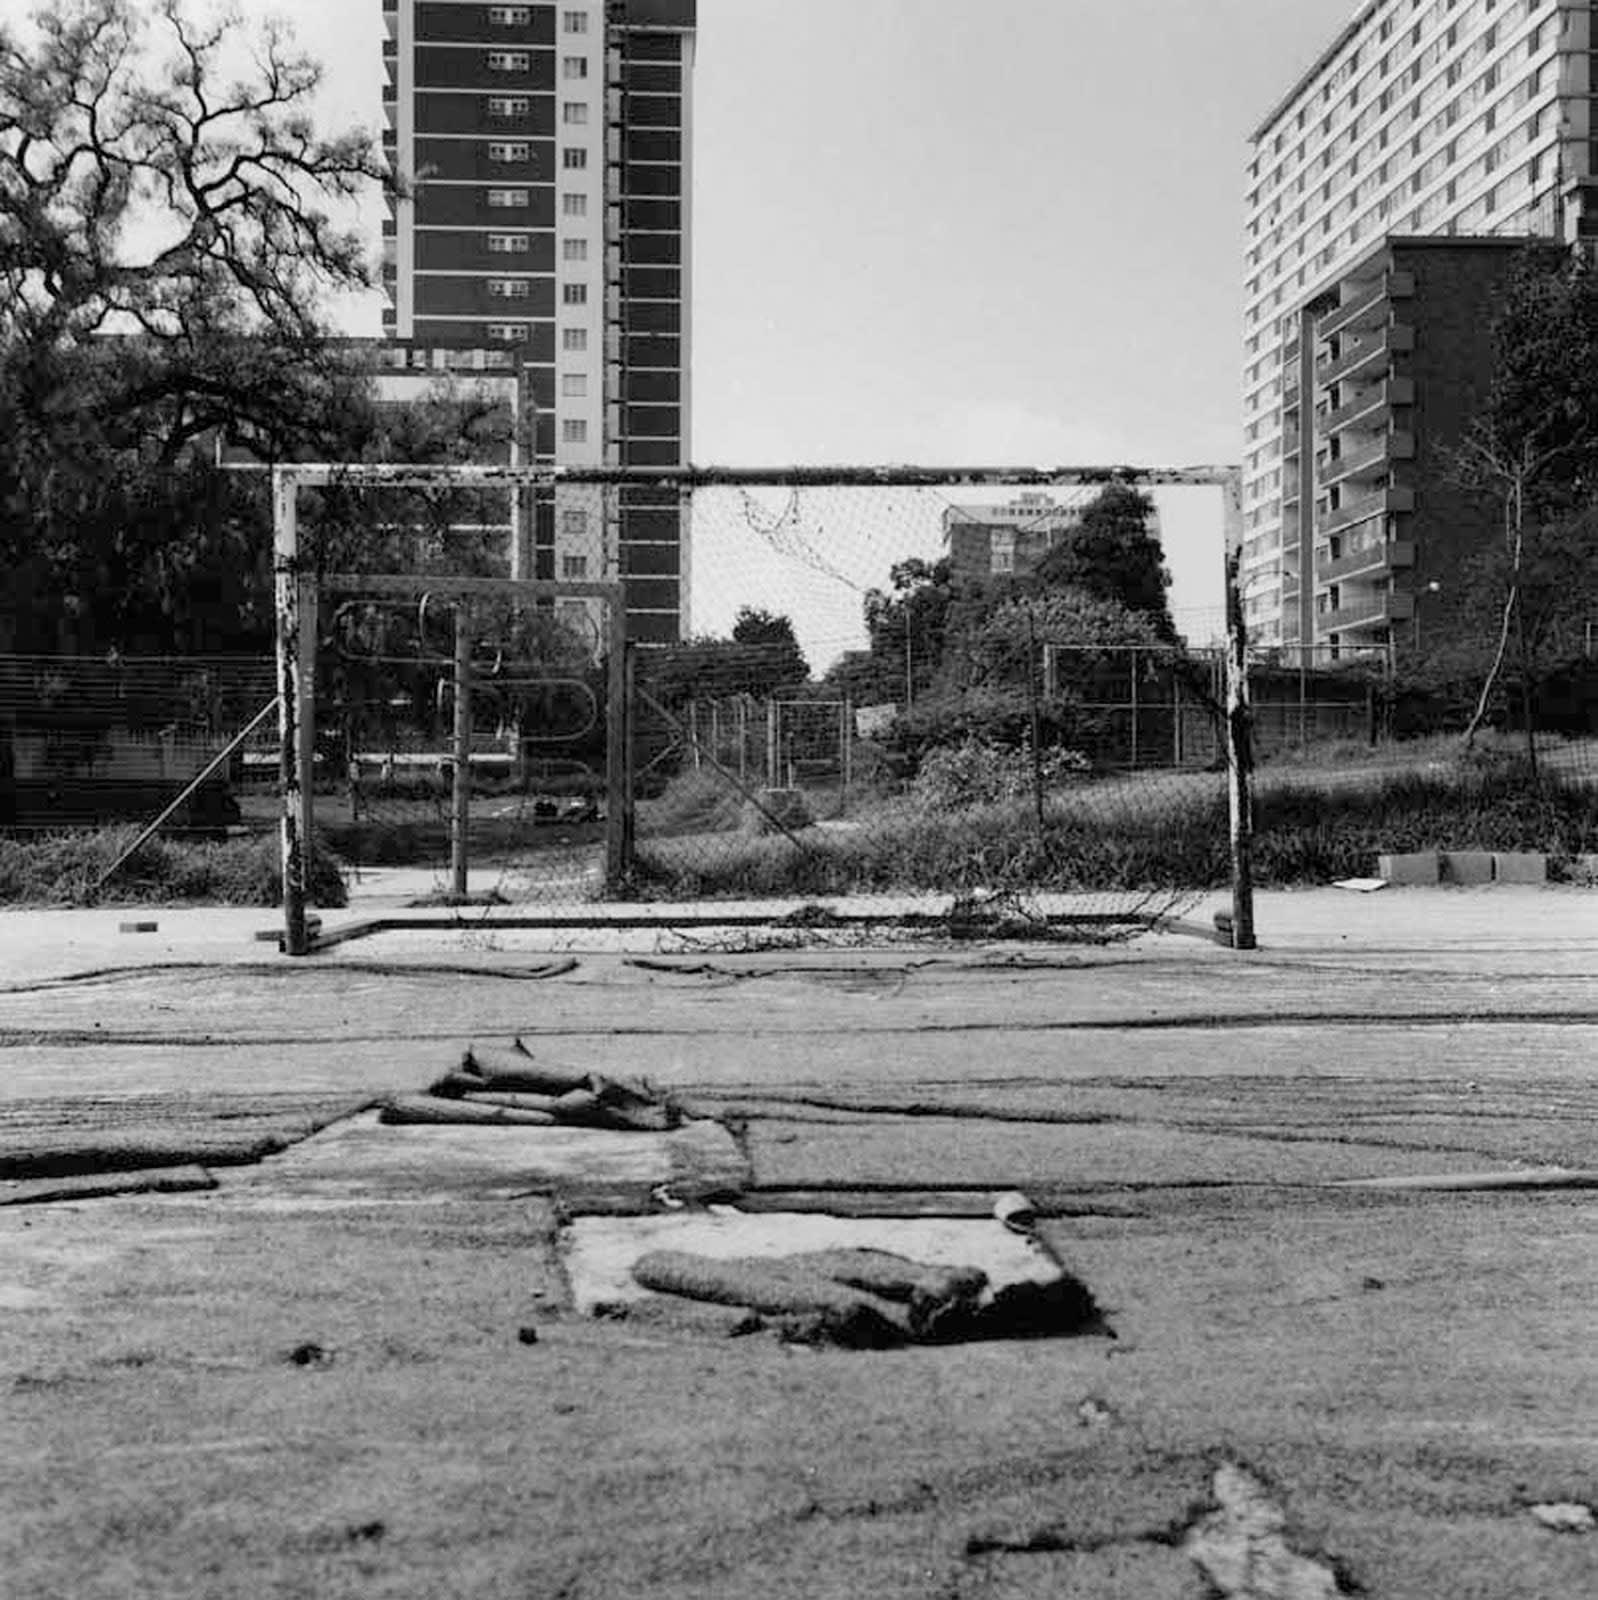 Pierre Schwartz, Johannesburg #1, Afrique du Sud, 1998